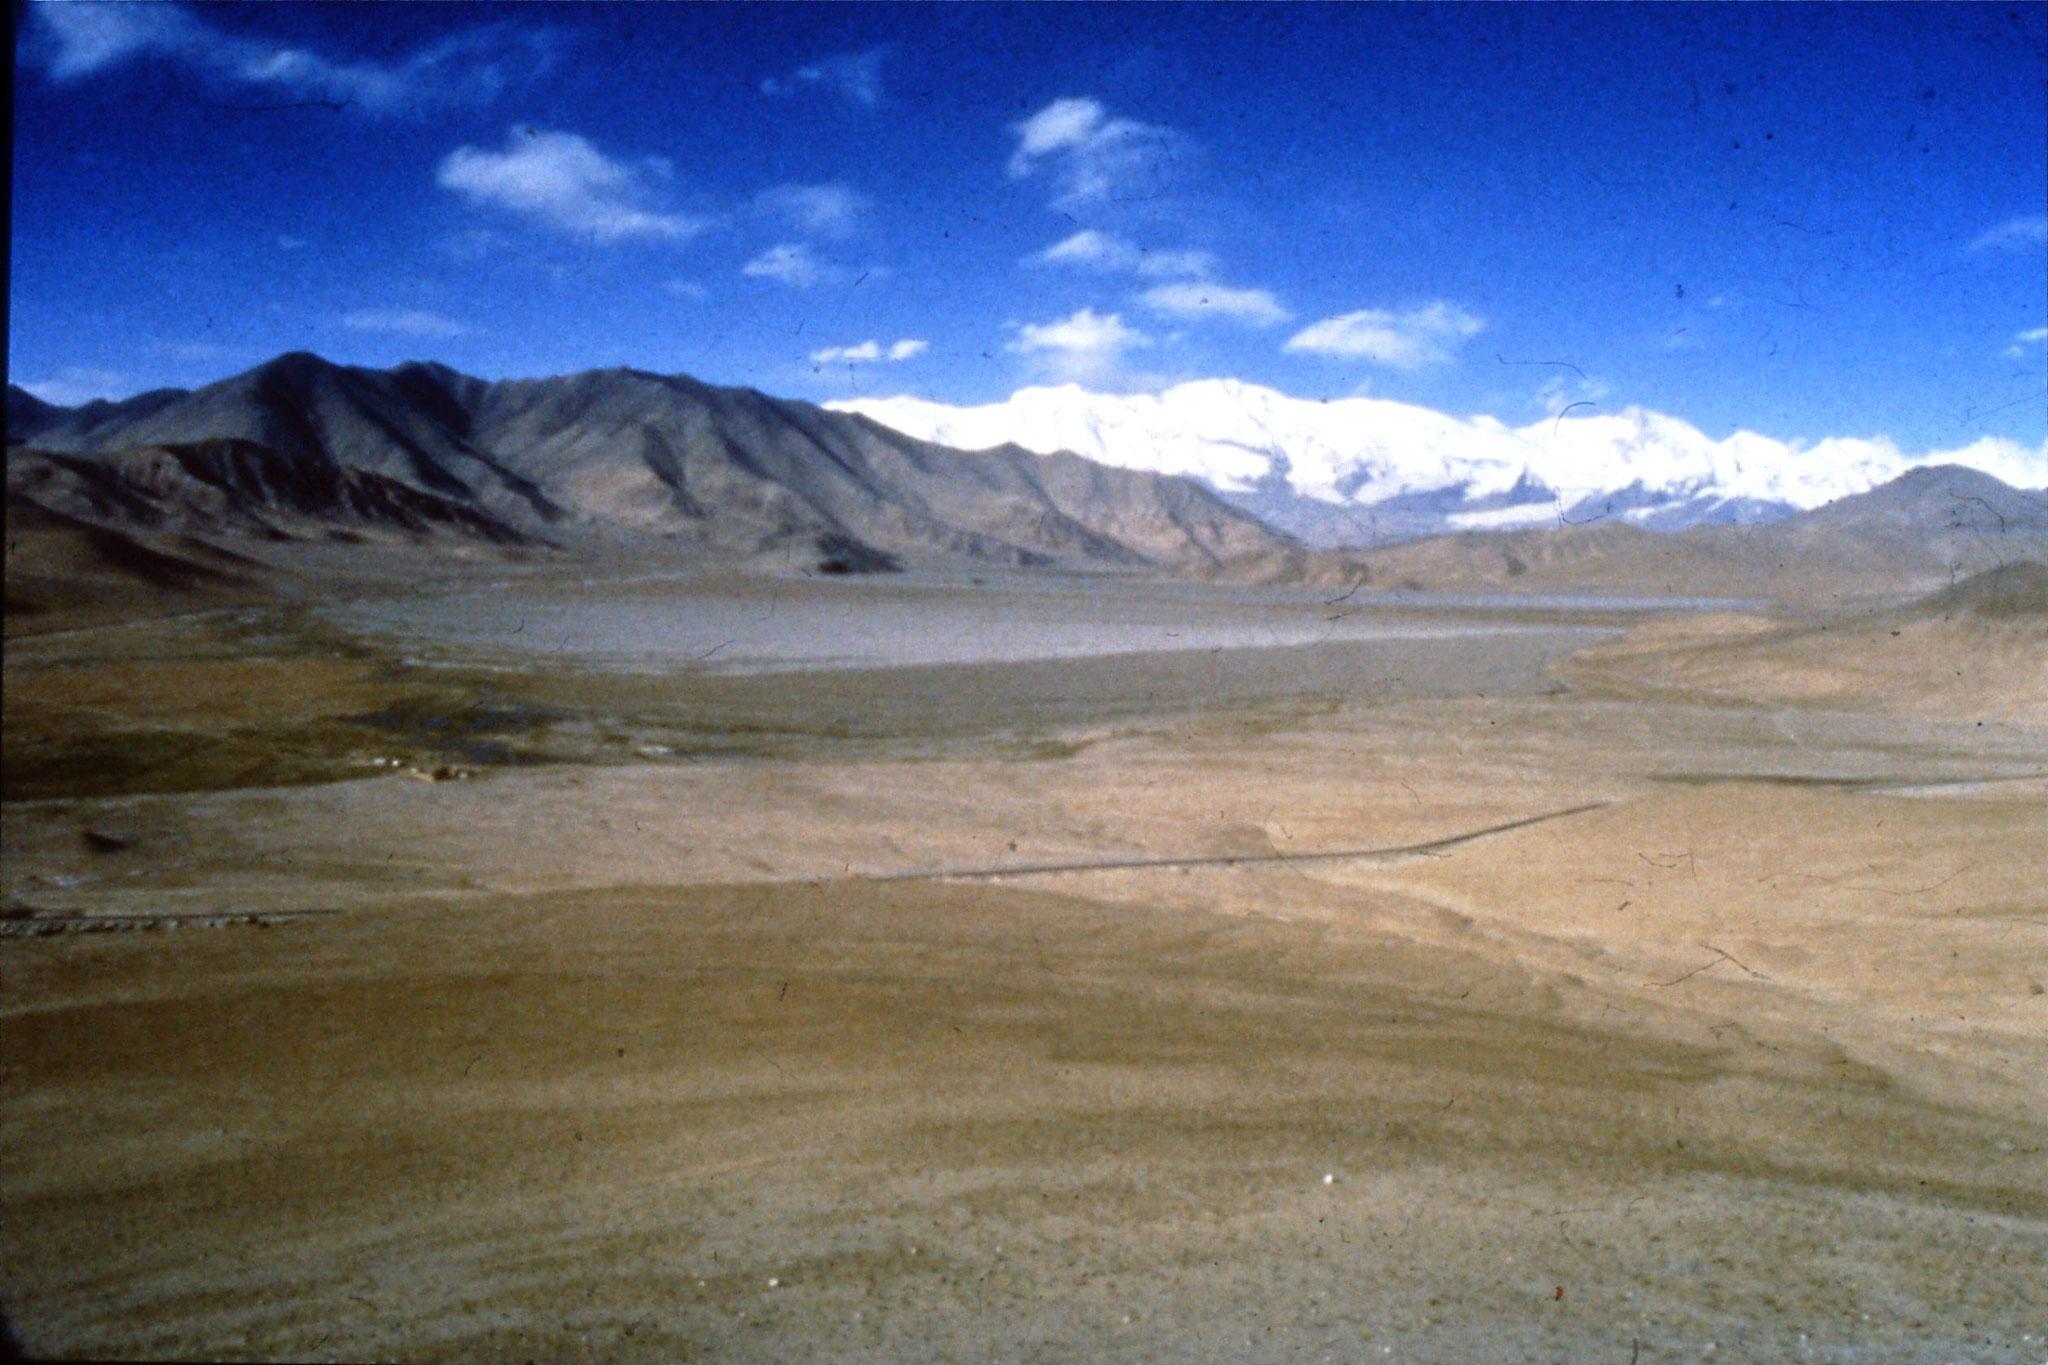 11/9/1989:23: Karakoram Highway 1500